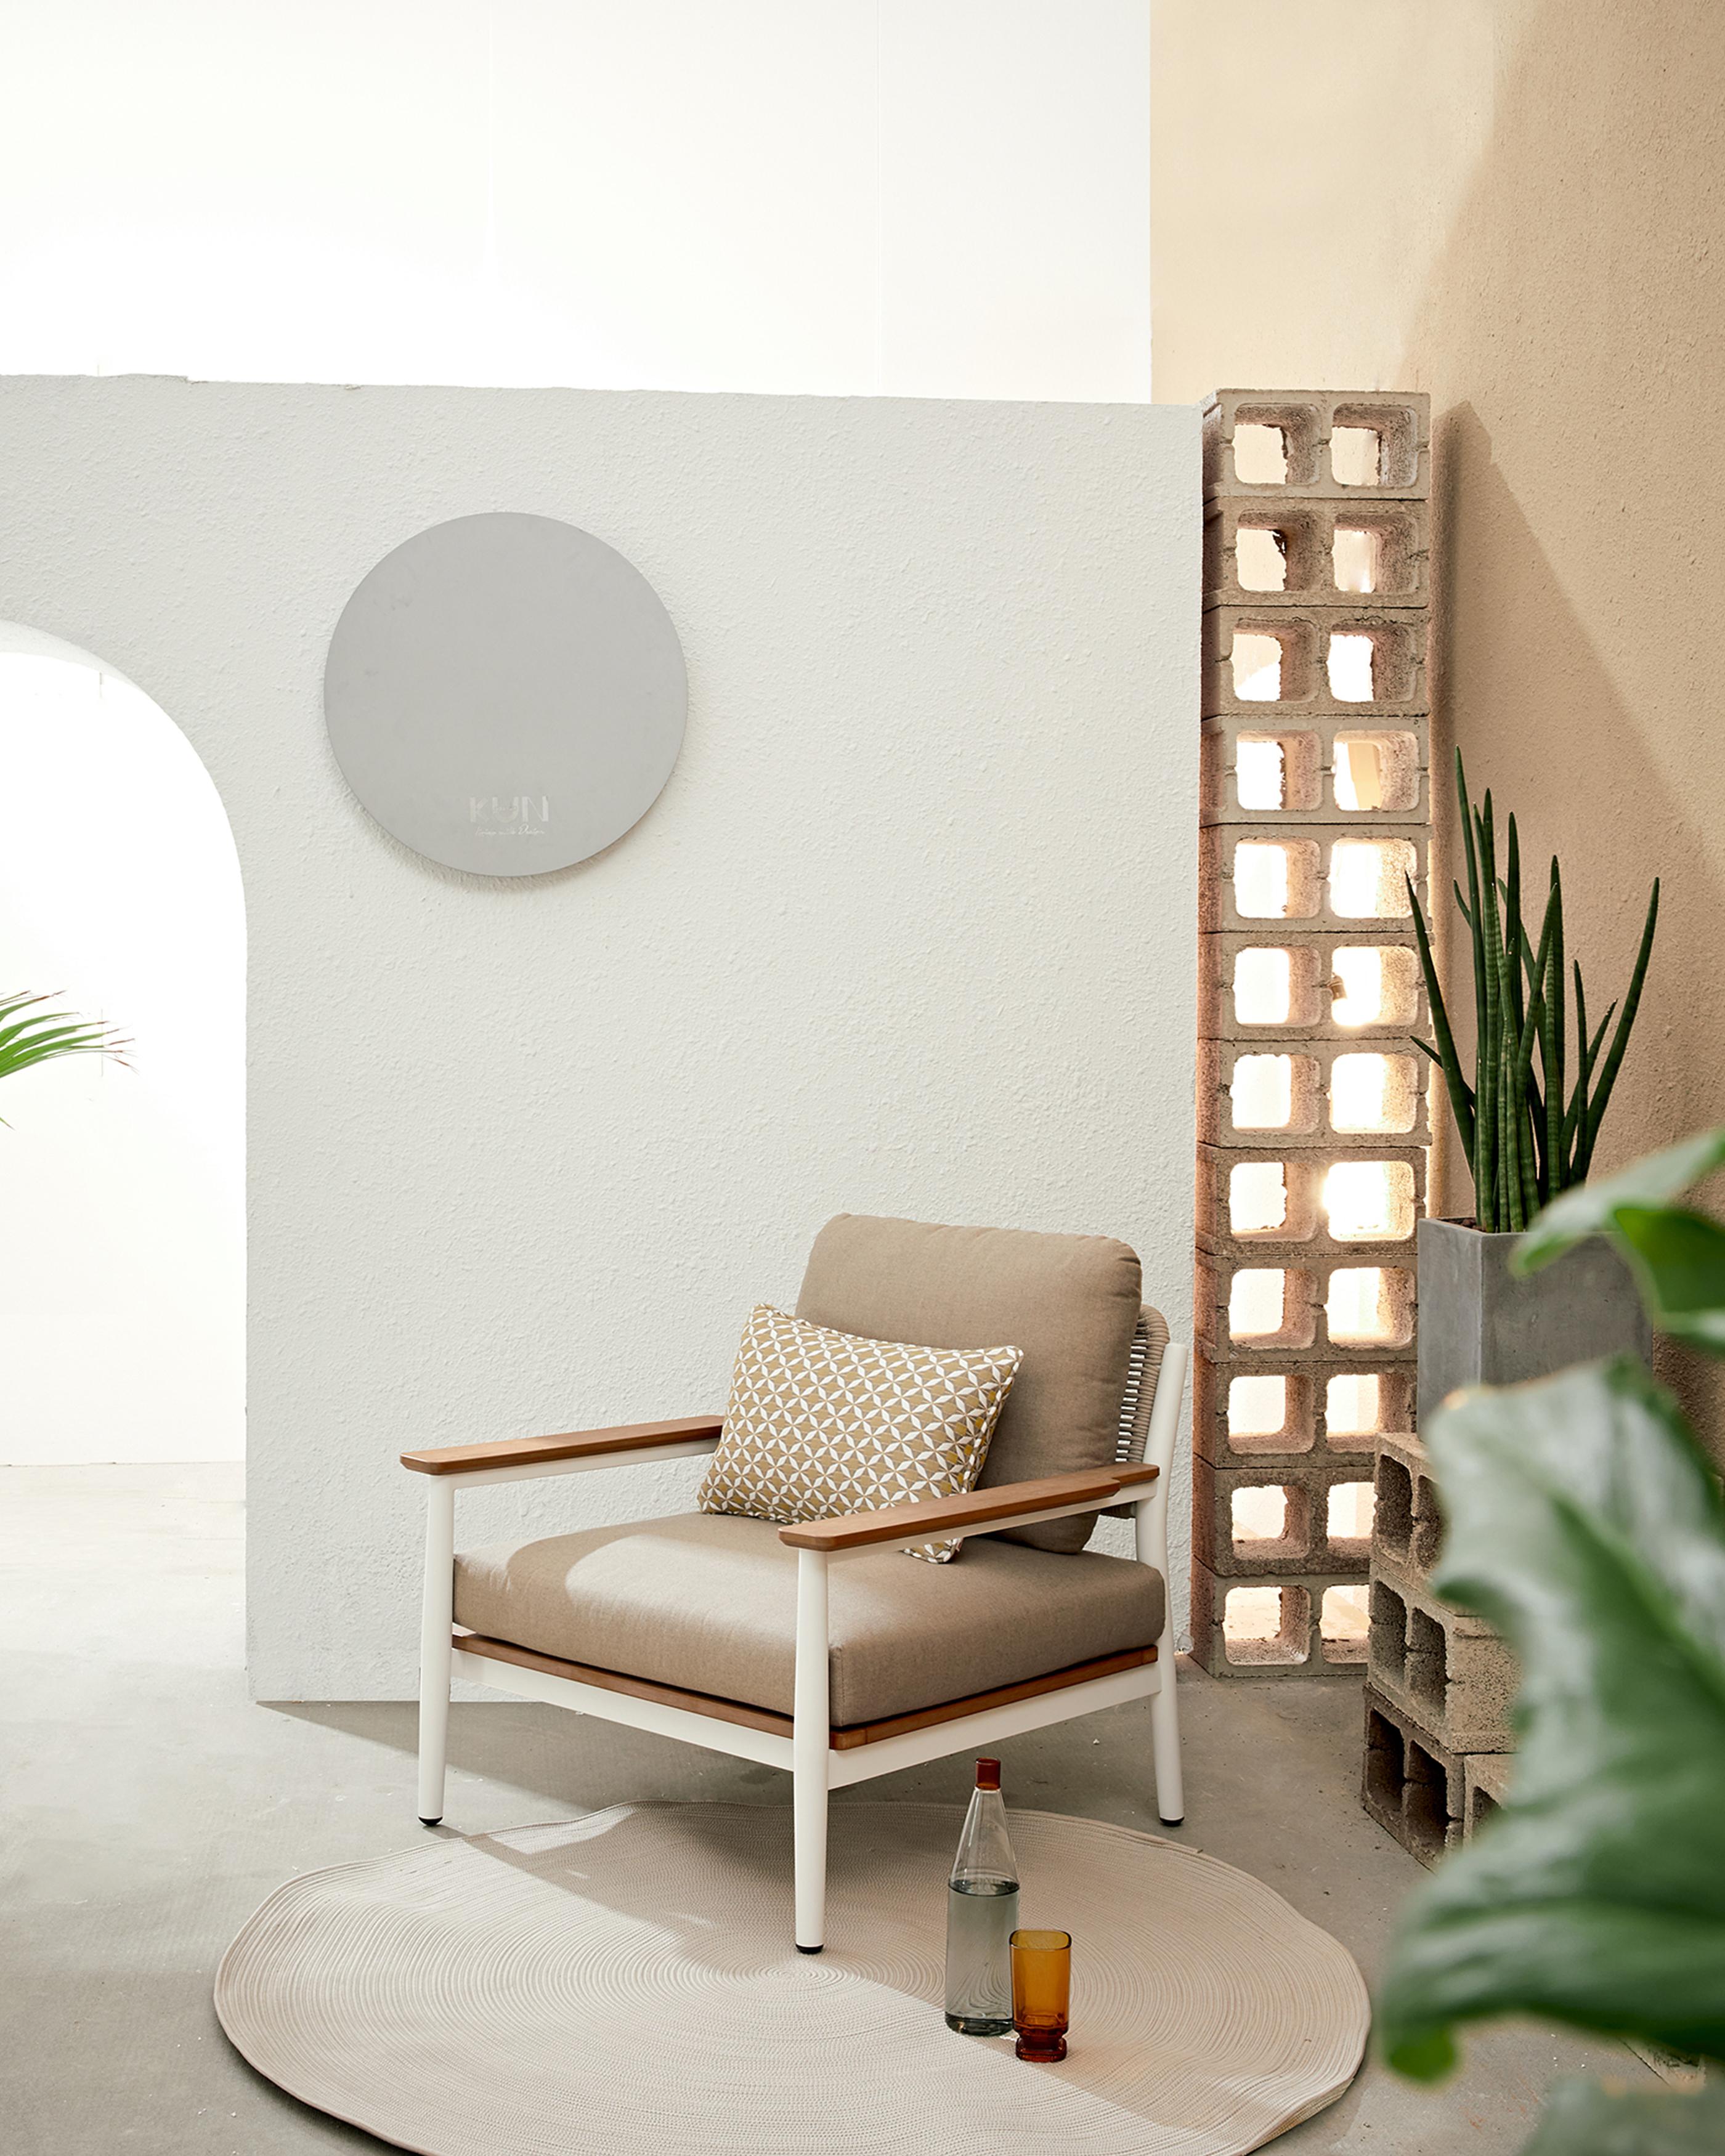 kundesign furniture company   ICFF